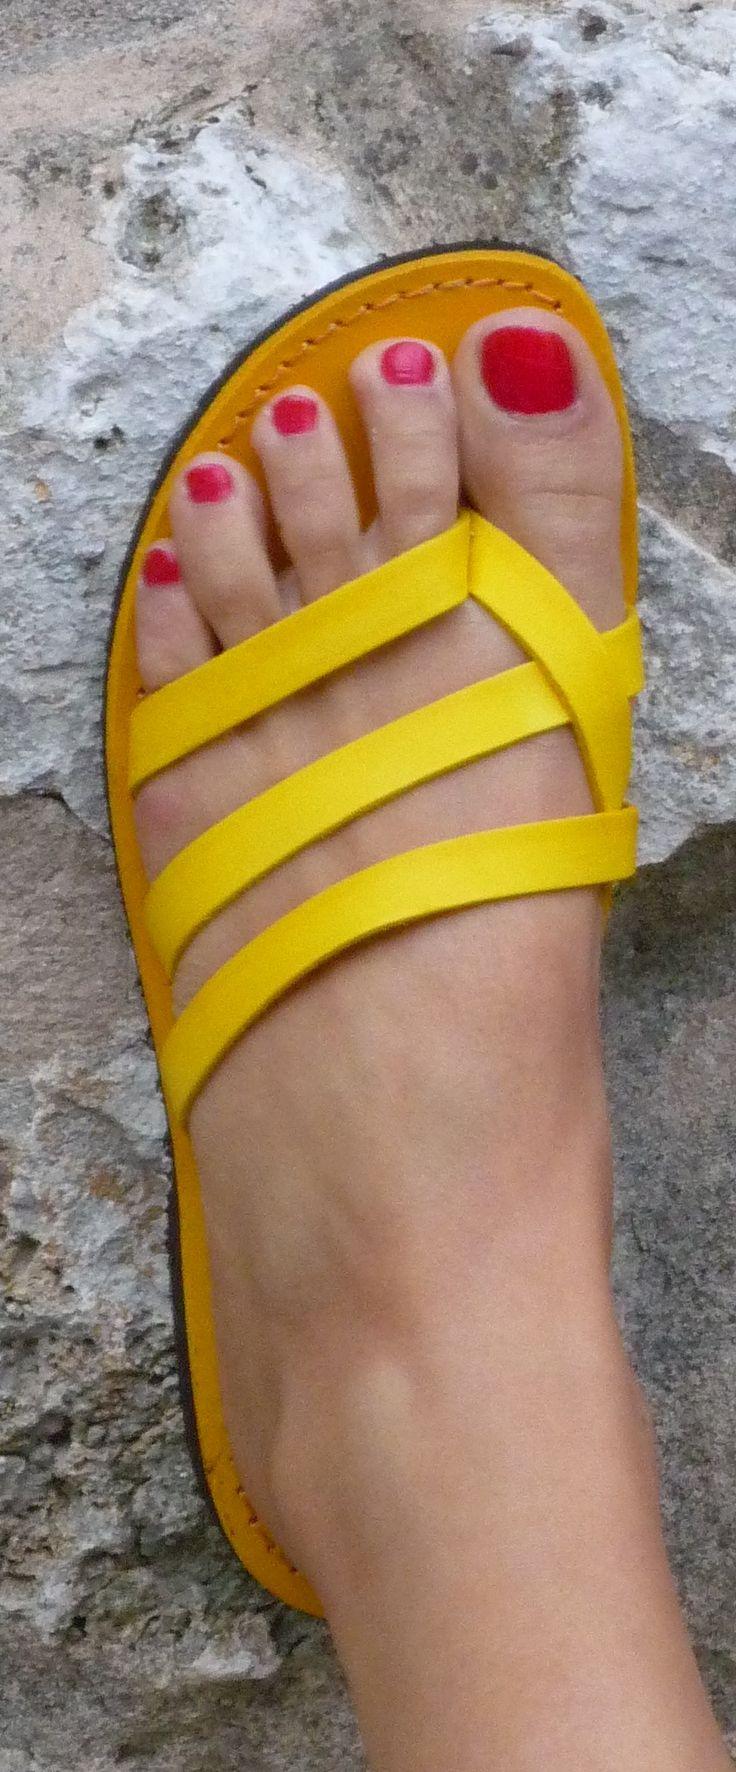 Yellow Summer Sandals 2014